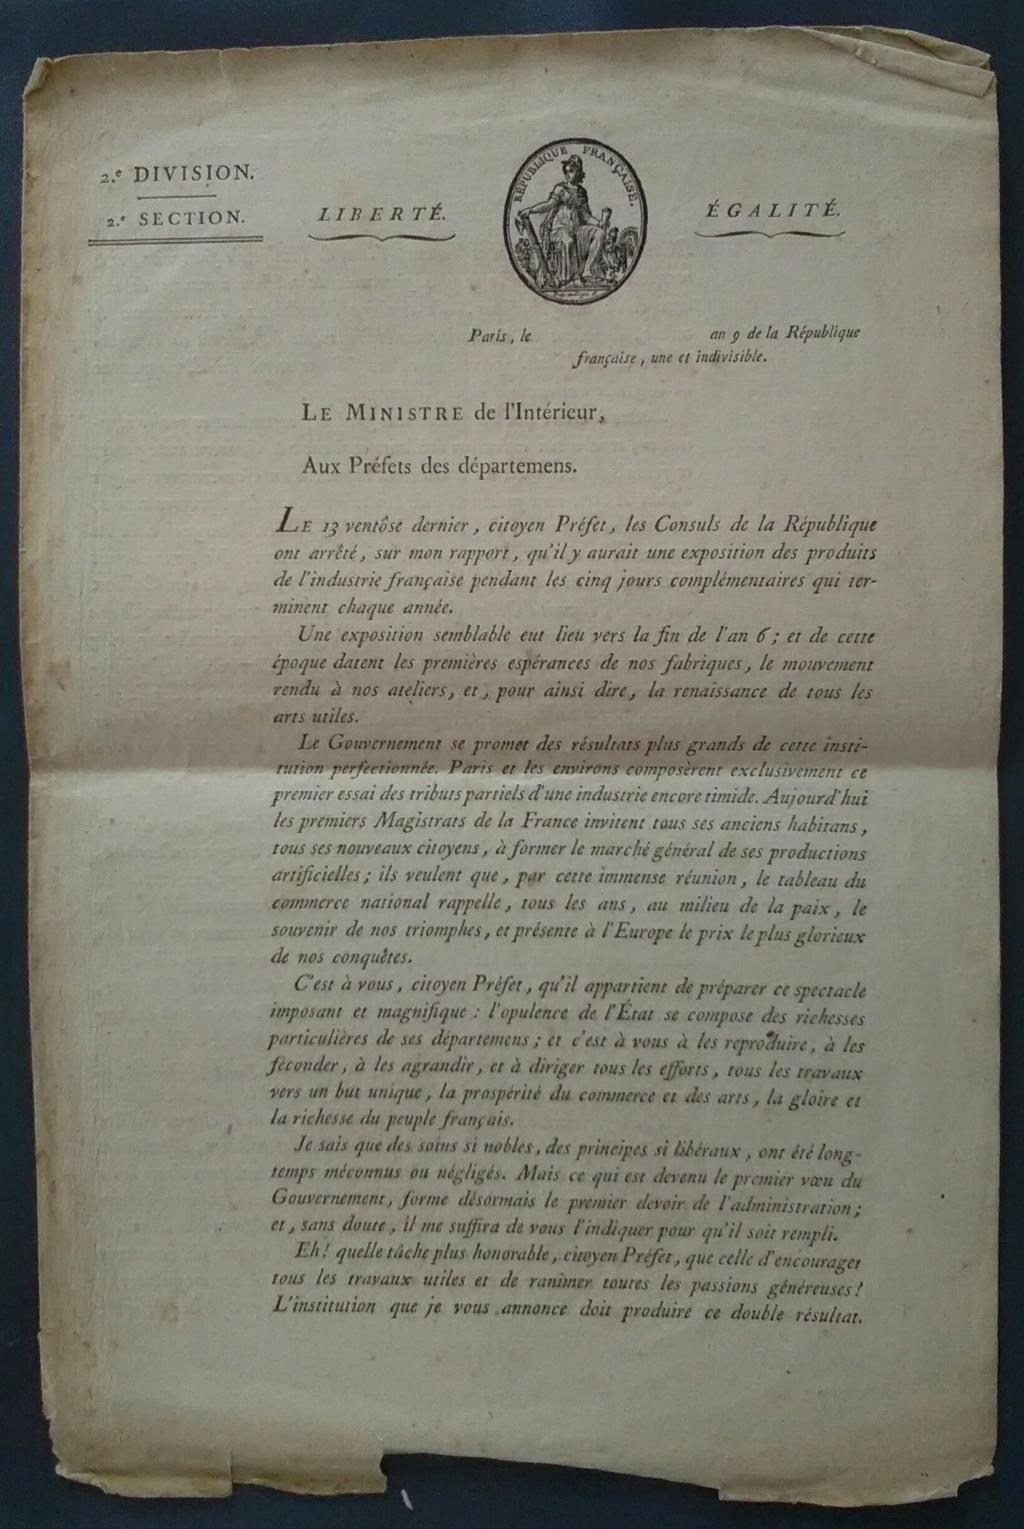 Authentification - signature Jean-Antoine Chaptal - an IX Img_2818